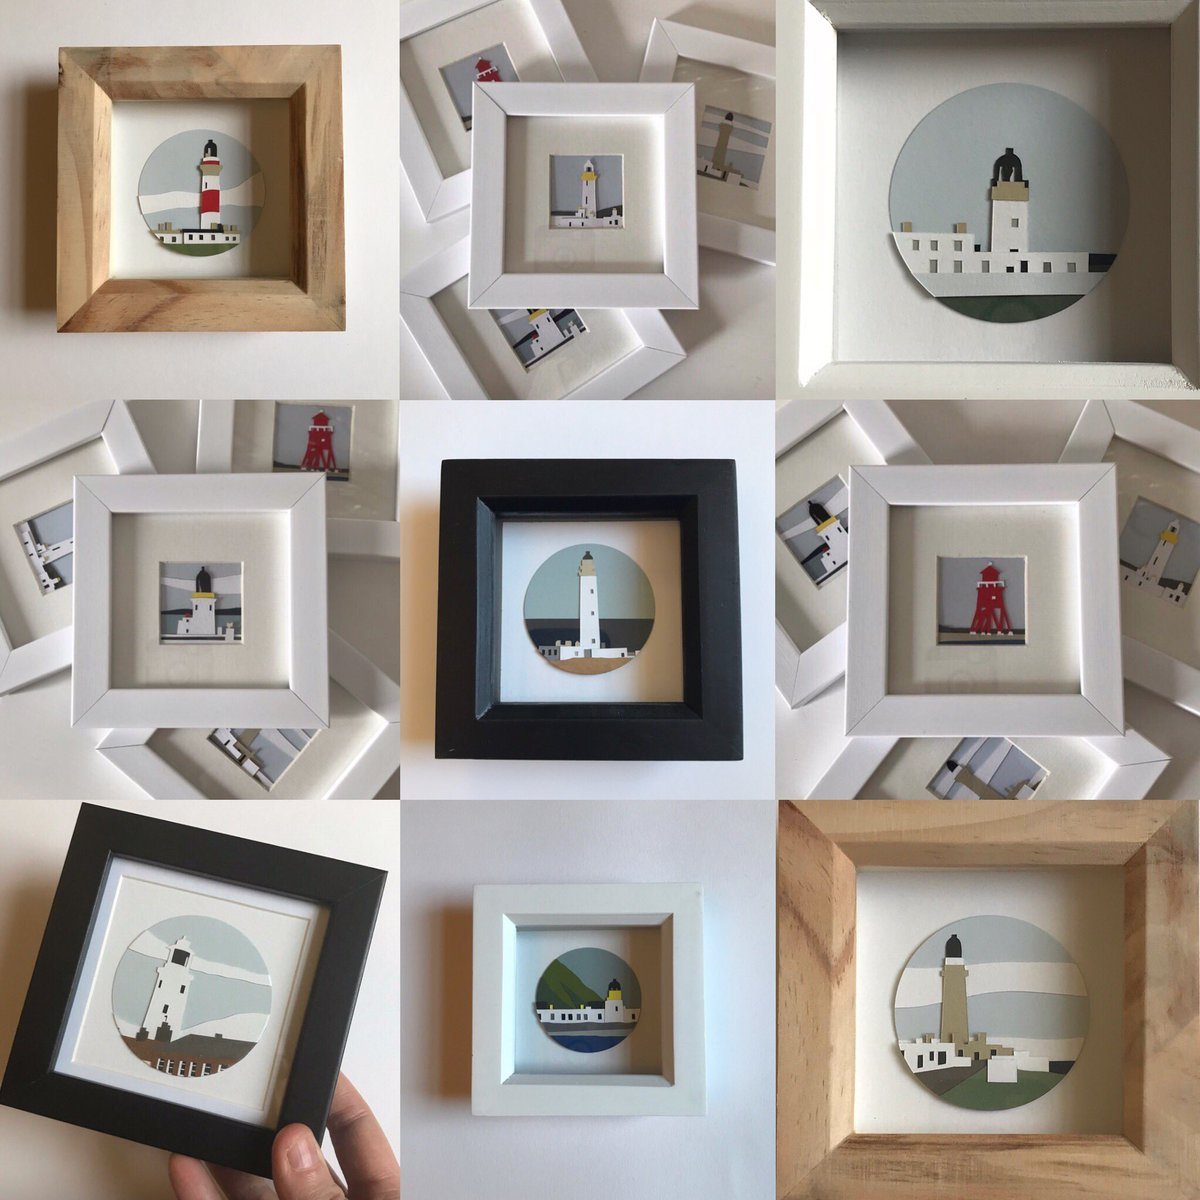 My Lighthouse ♥️ SALE is on until Monday if anyone loves a miniature!! #artist #design #handmadehour #paperart #papercraft #paperartist #papercut #landscape #architecture #etsy #etsyseller #miniatures #sale